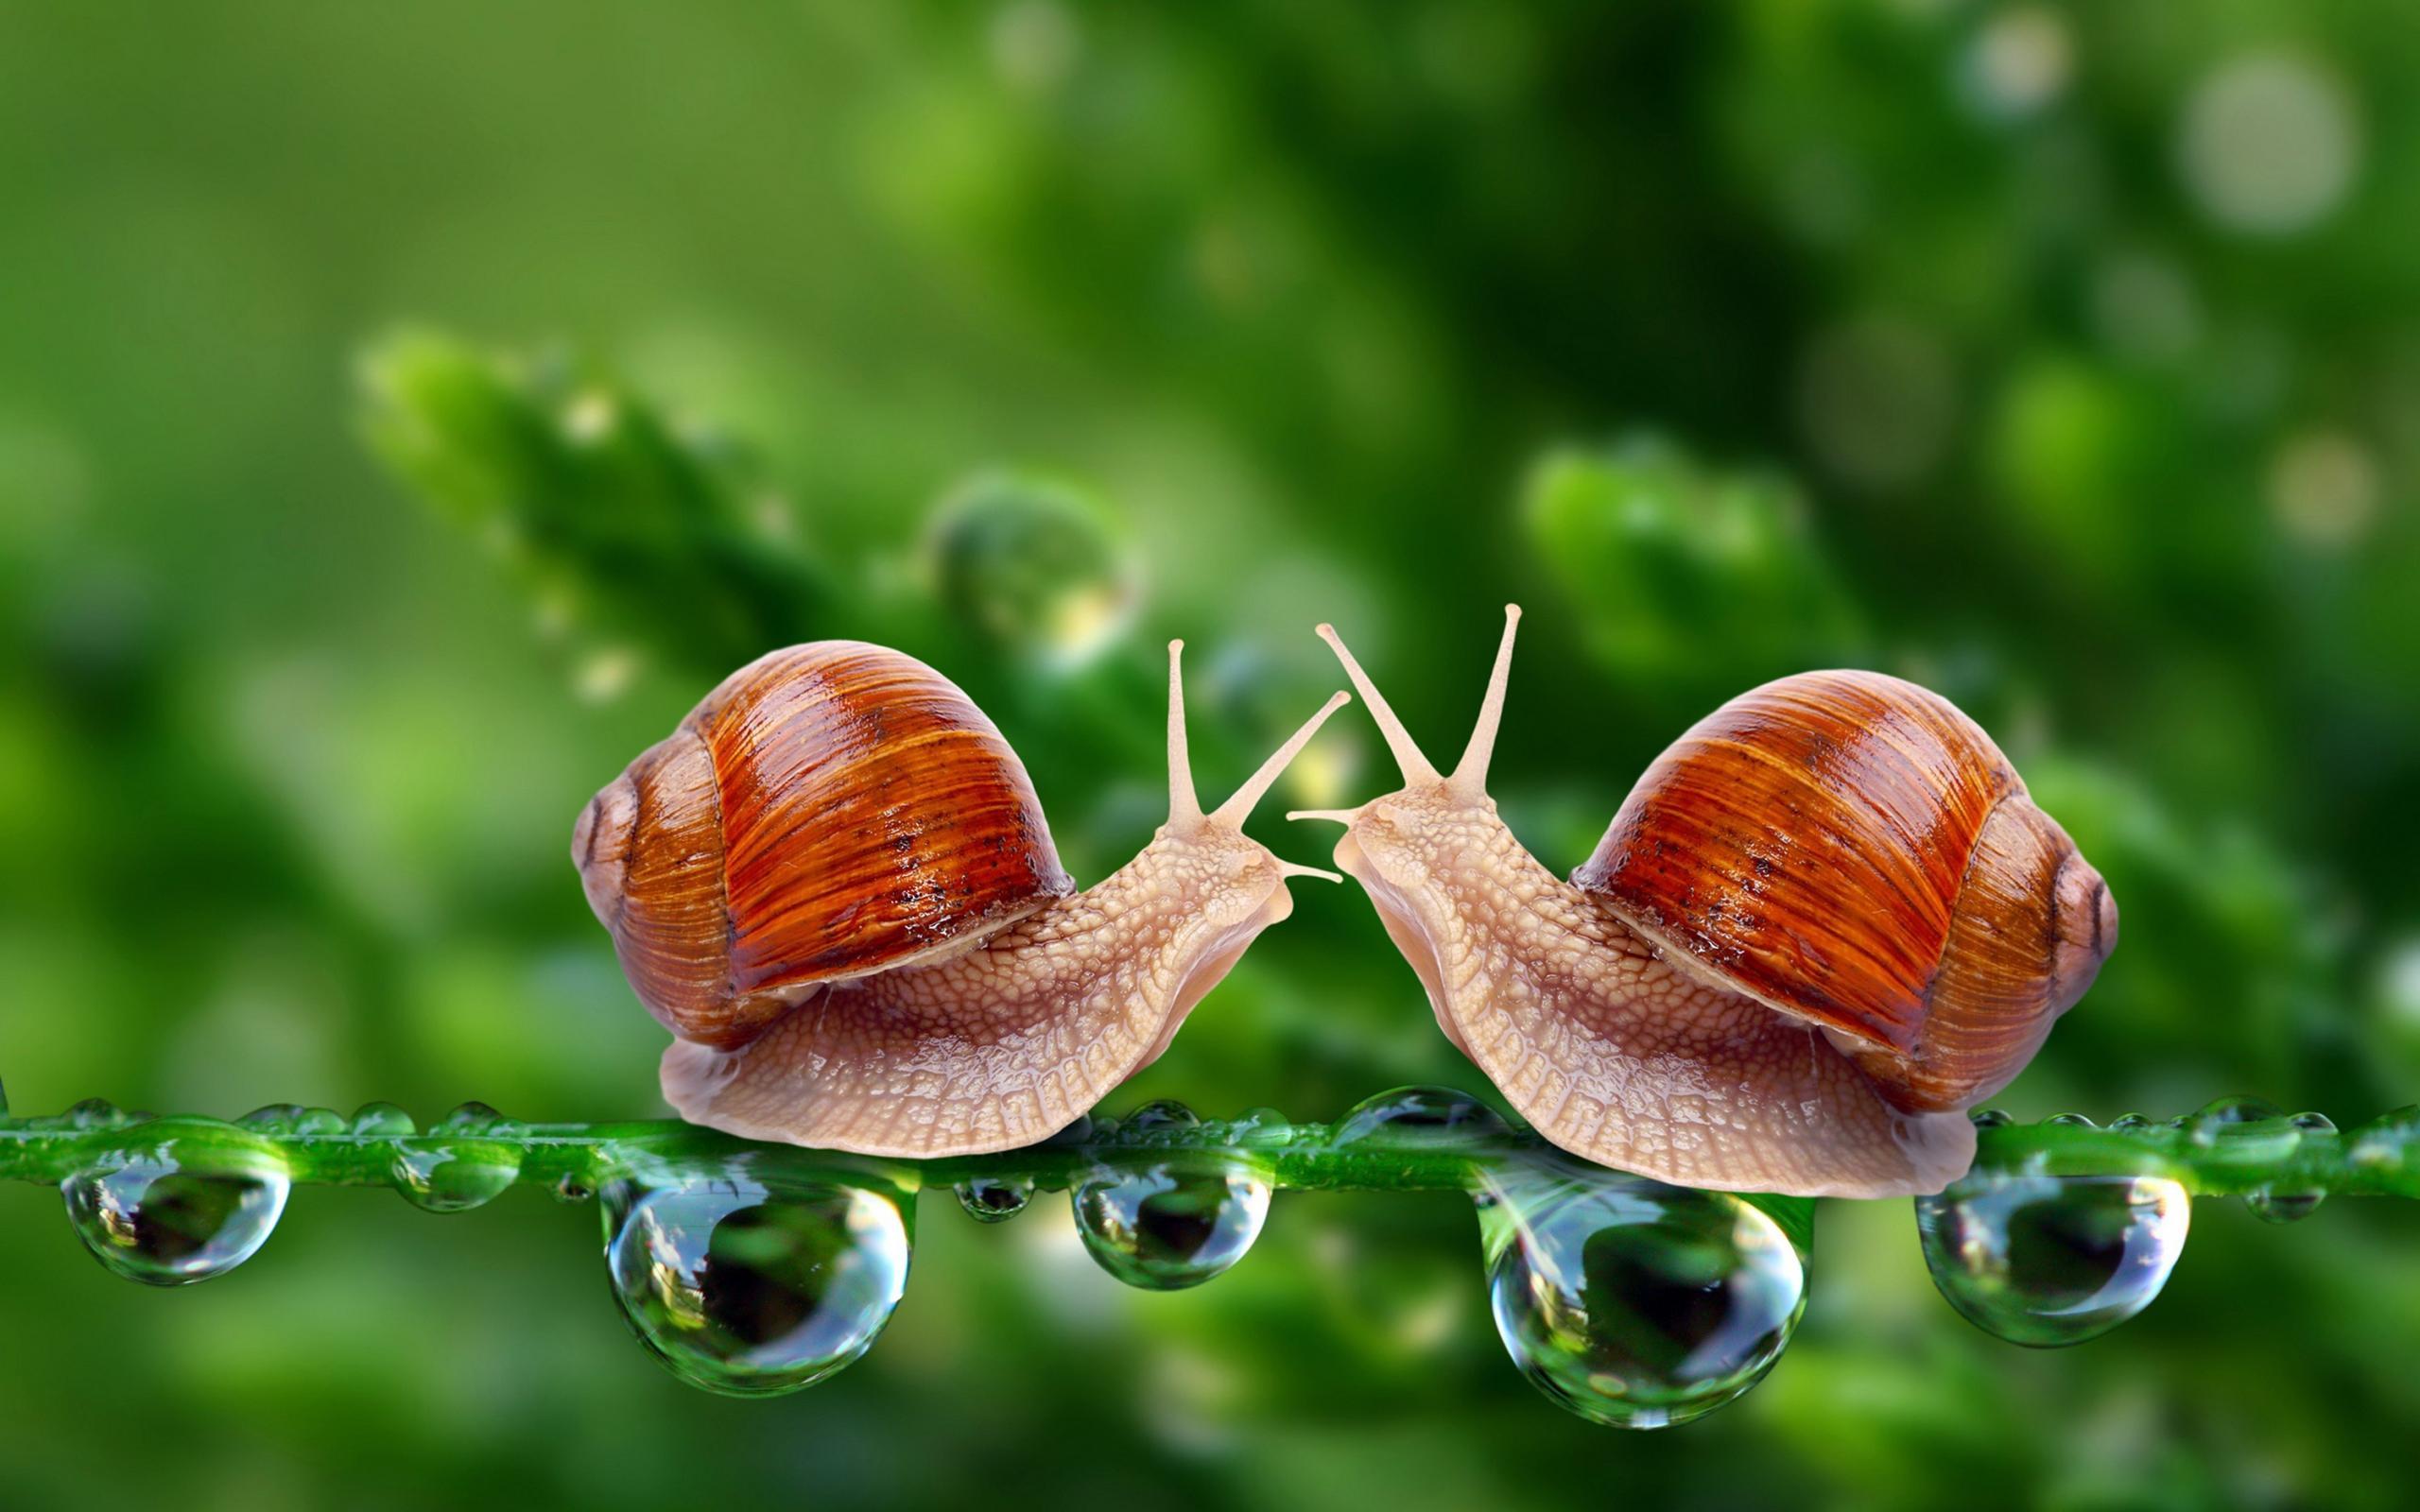 snail-wallpaper-hd ...